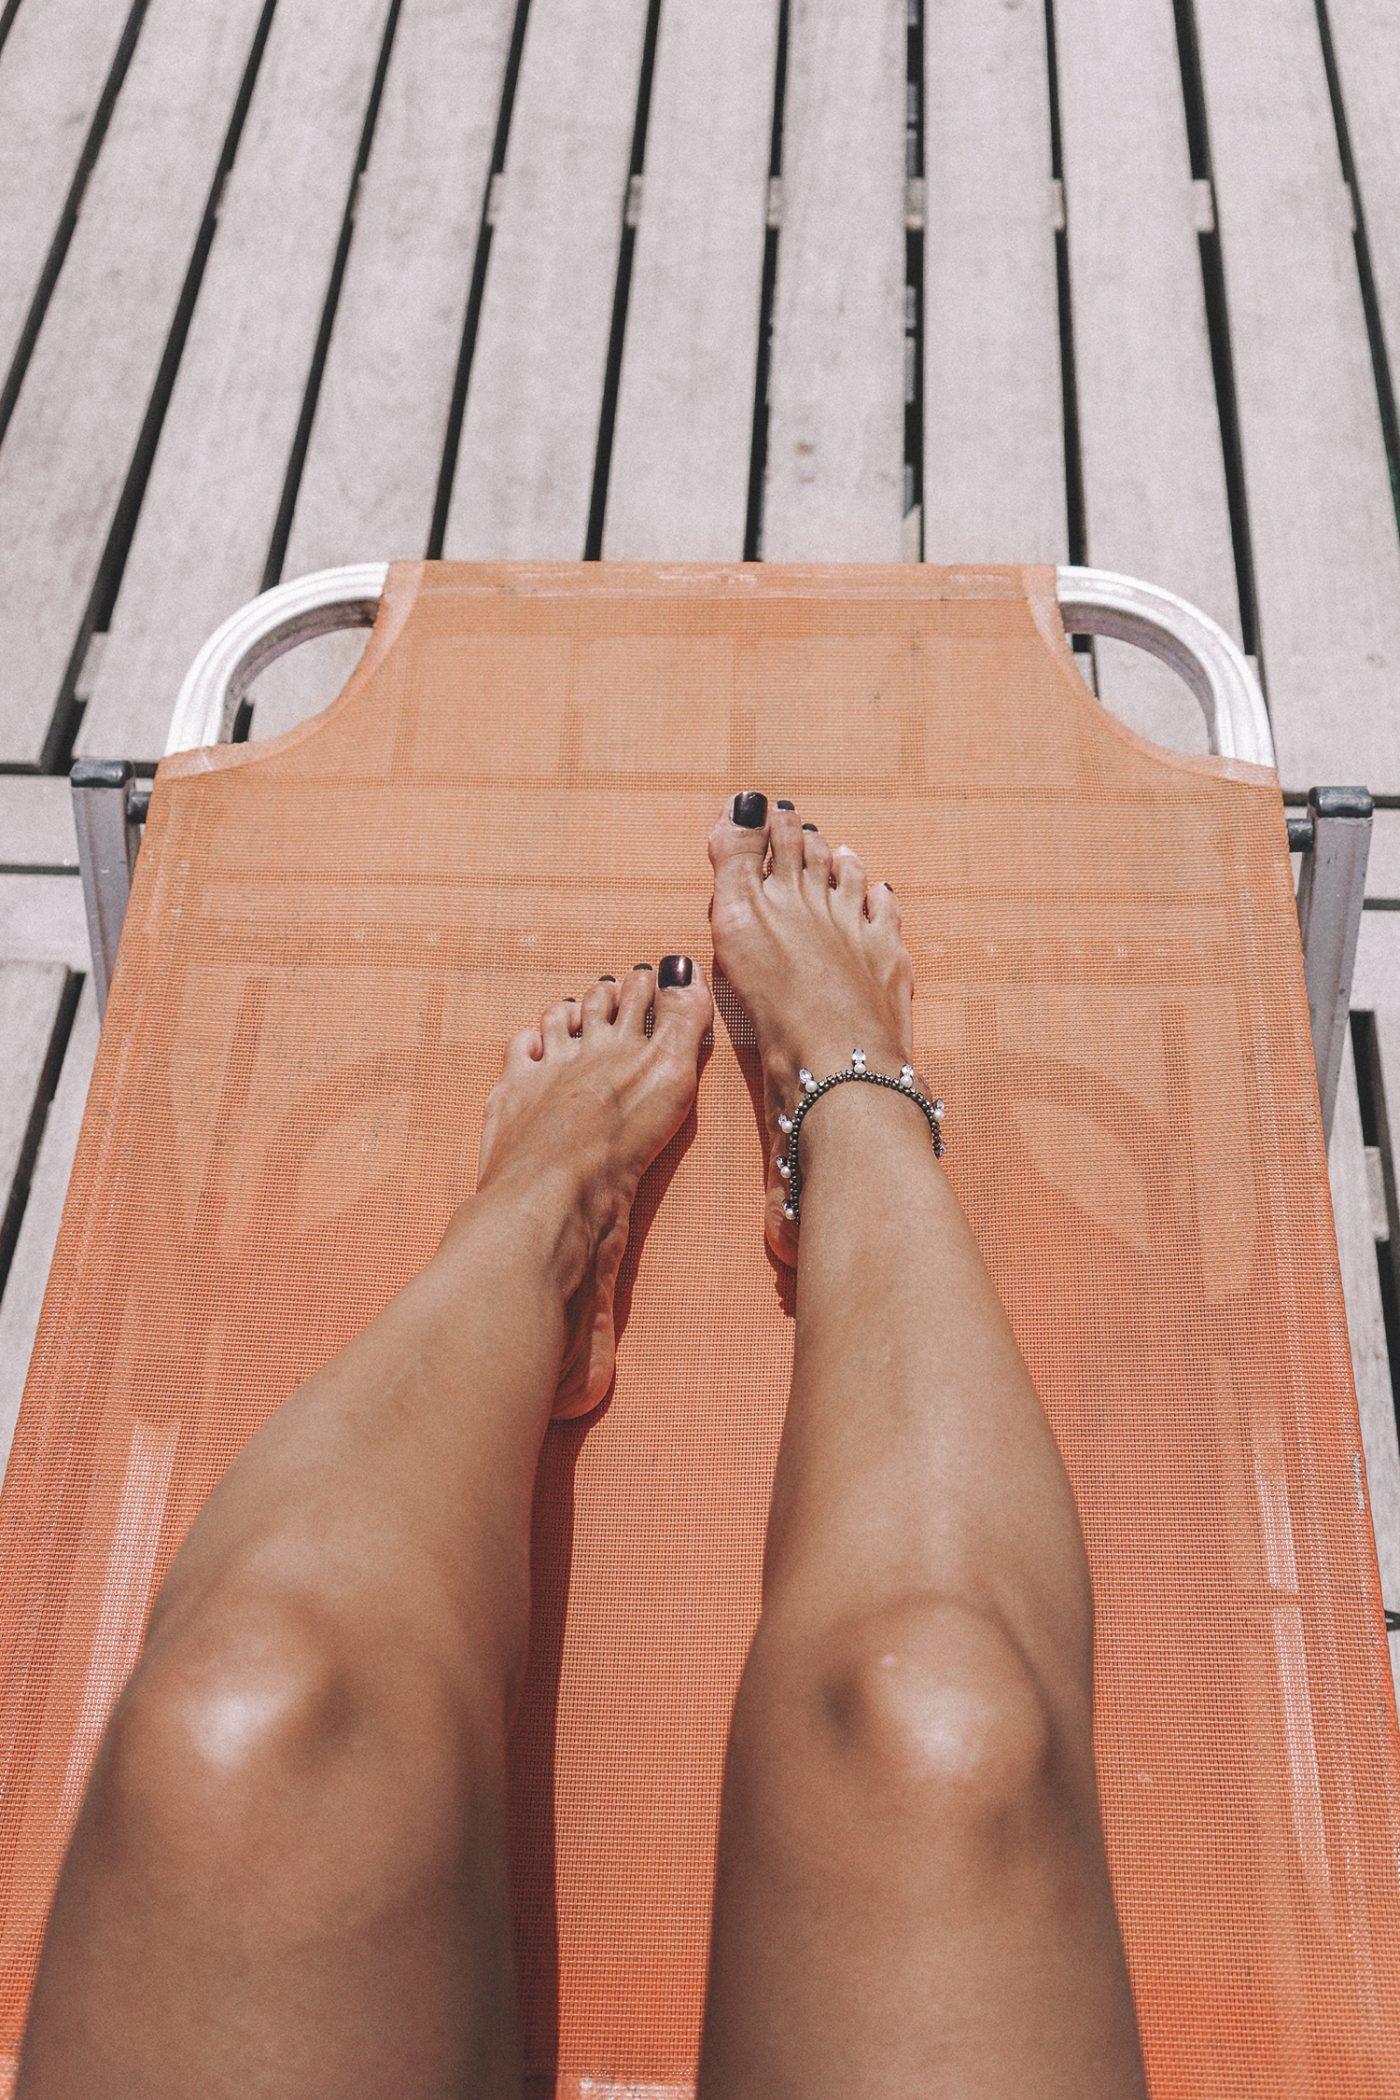 Mykonos-Beach-Summer-BeachWear-Bikini-For_Love_And_Lemons-Collage_Vintage-81